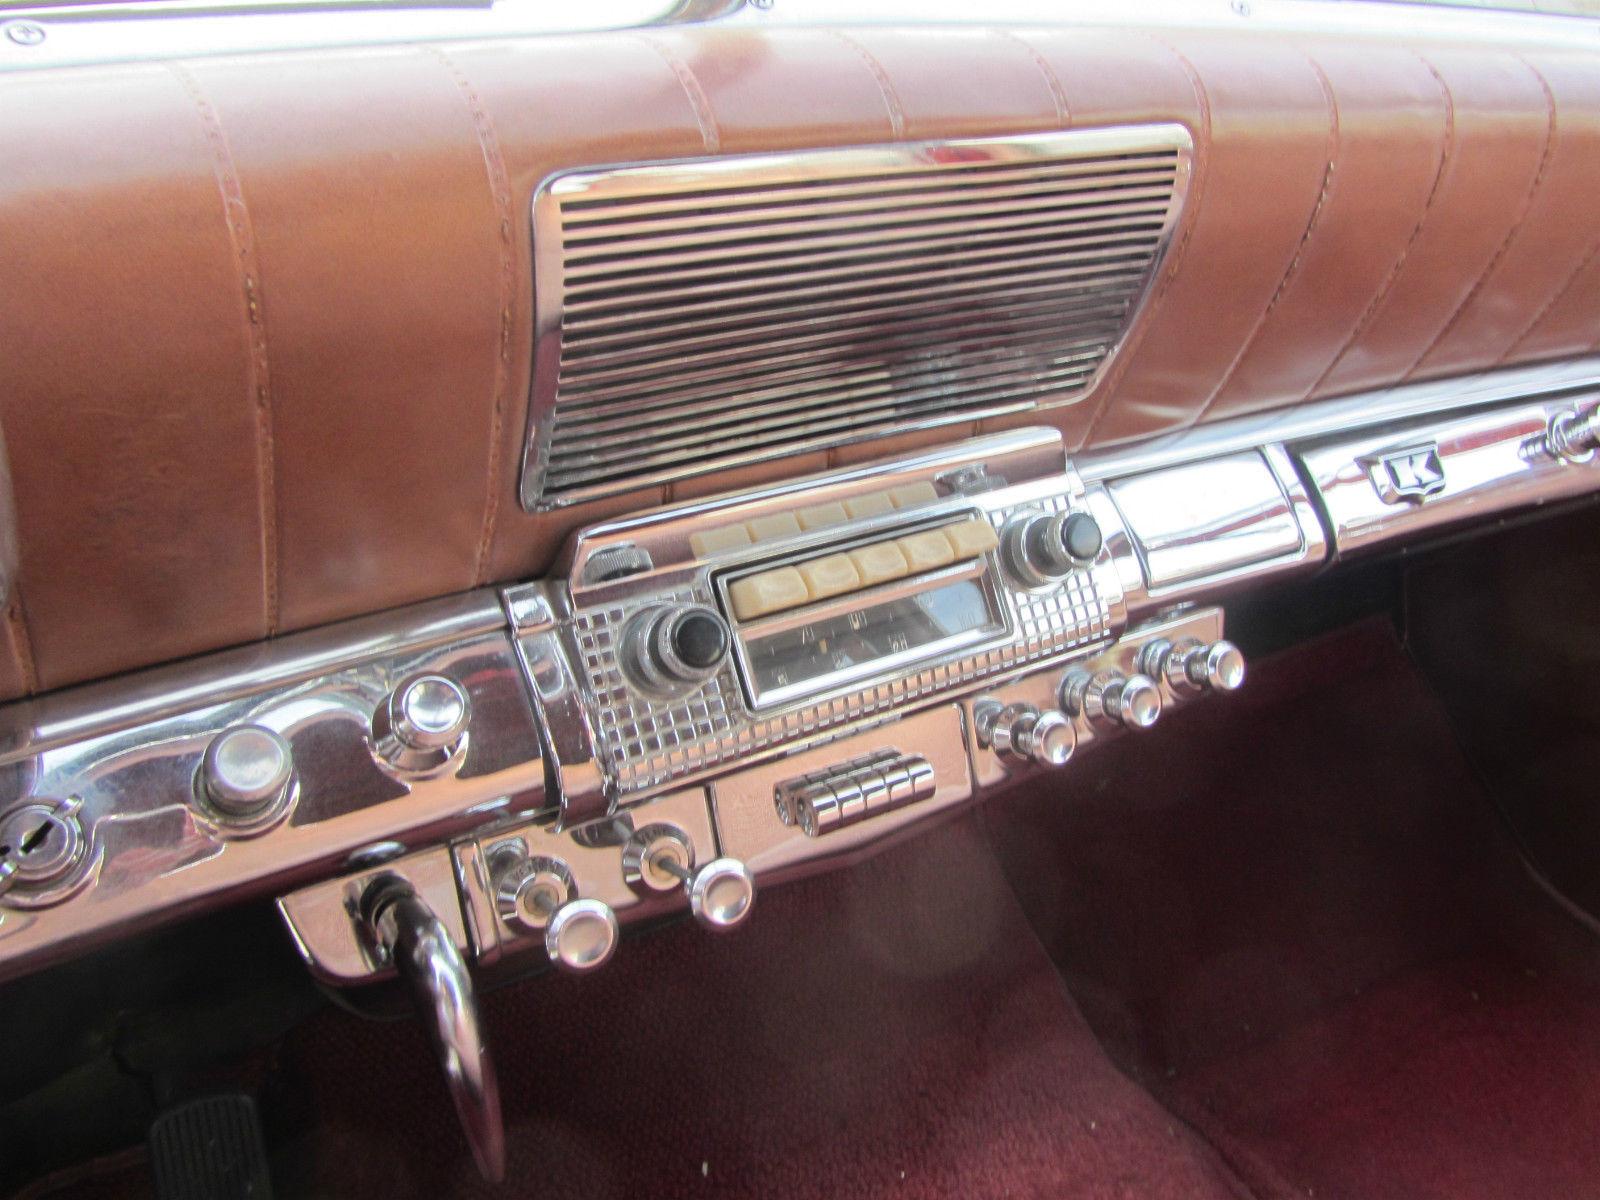 1951 Kaiser Deluxe 226 Supersonic Engine 3 Speed W Overdrive Ferrari Wiring Harness